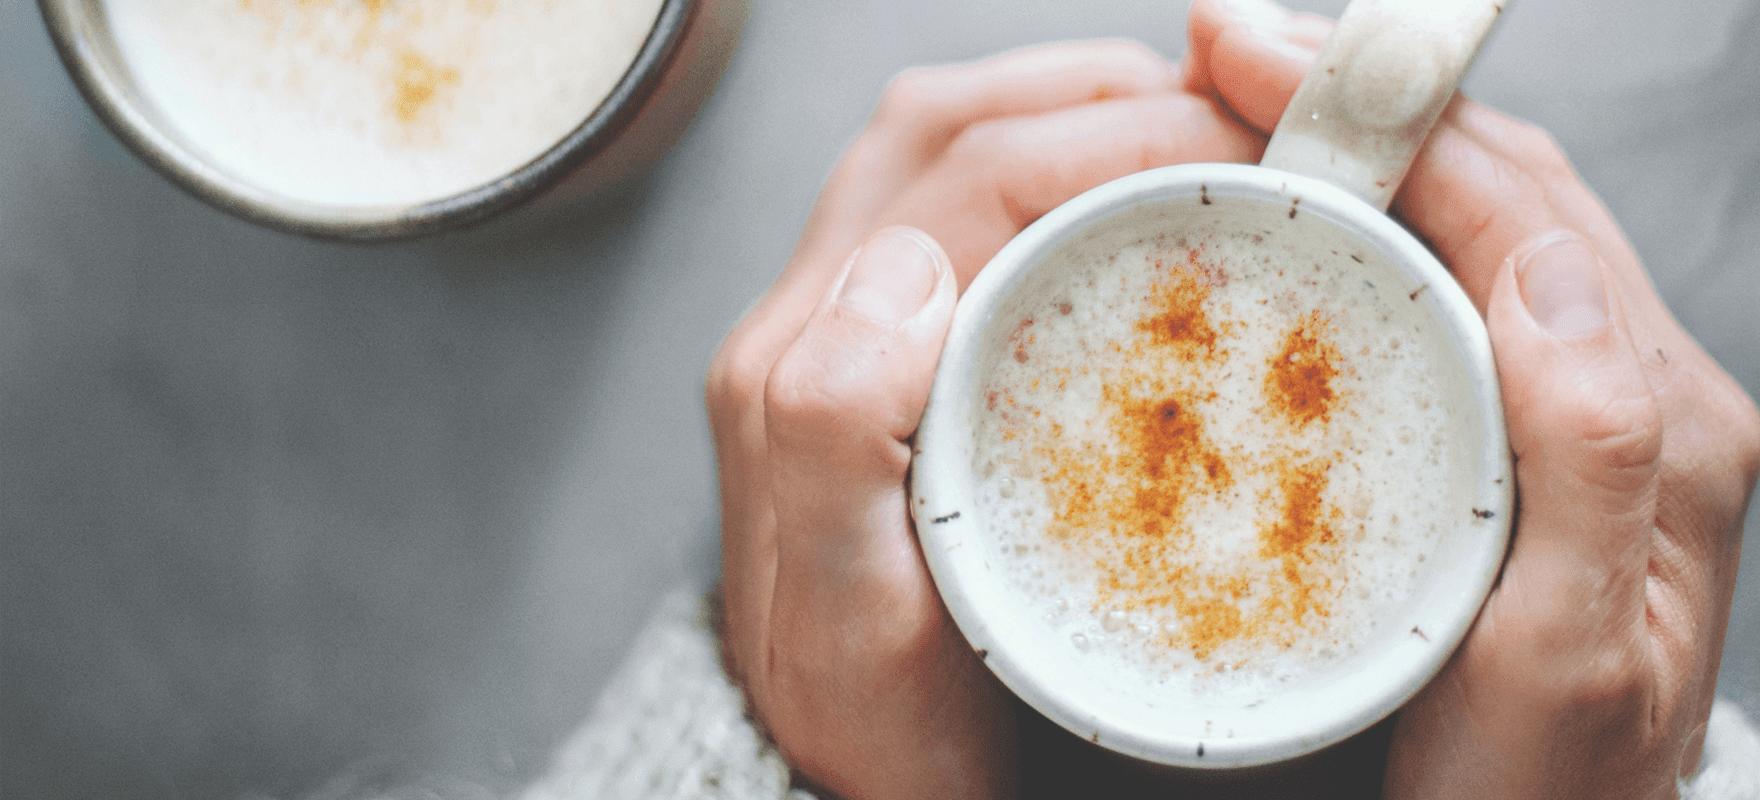 Chai latte image 1